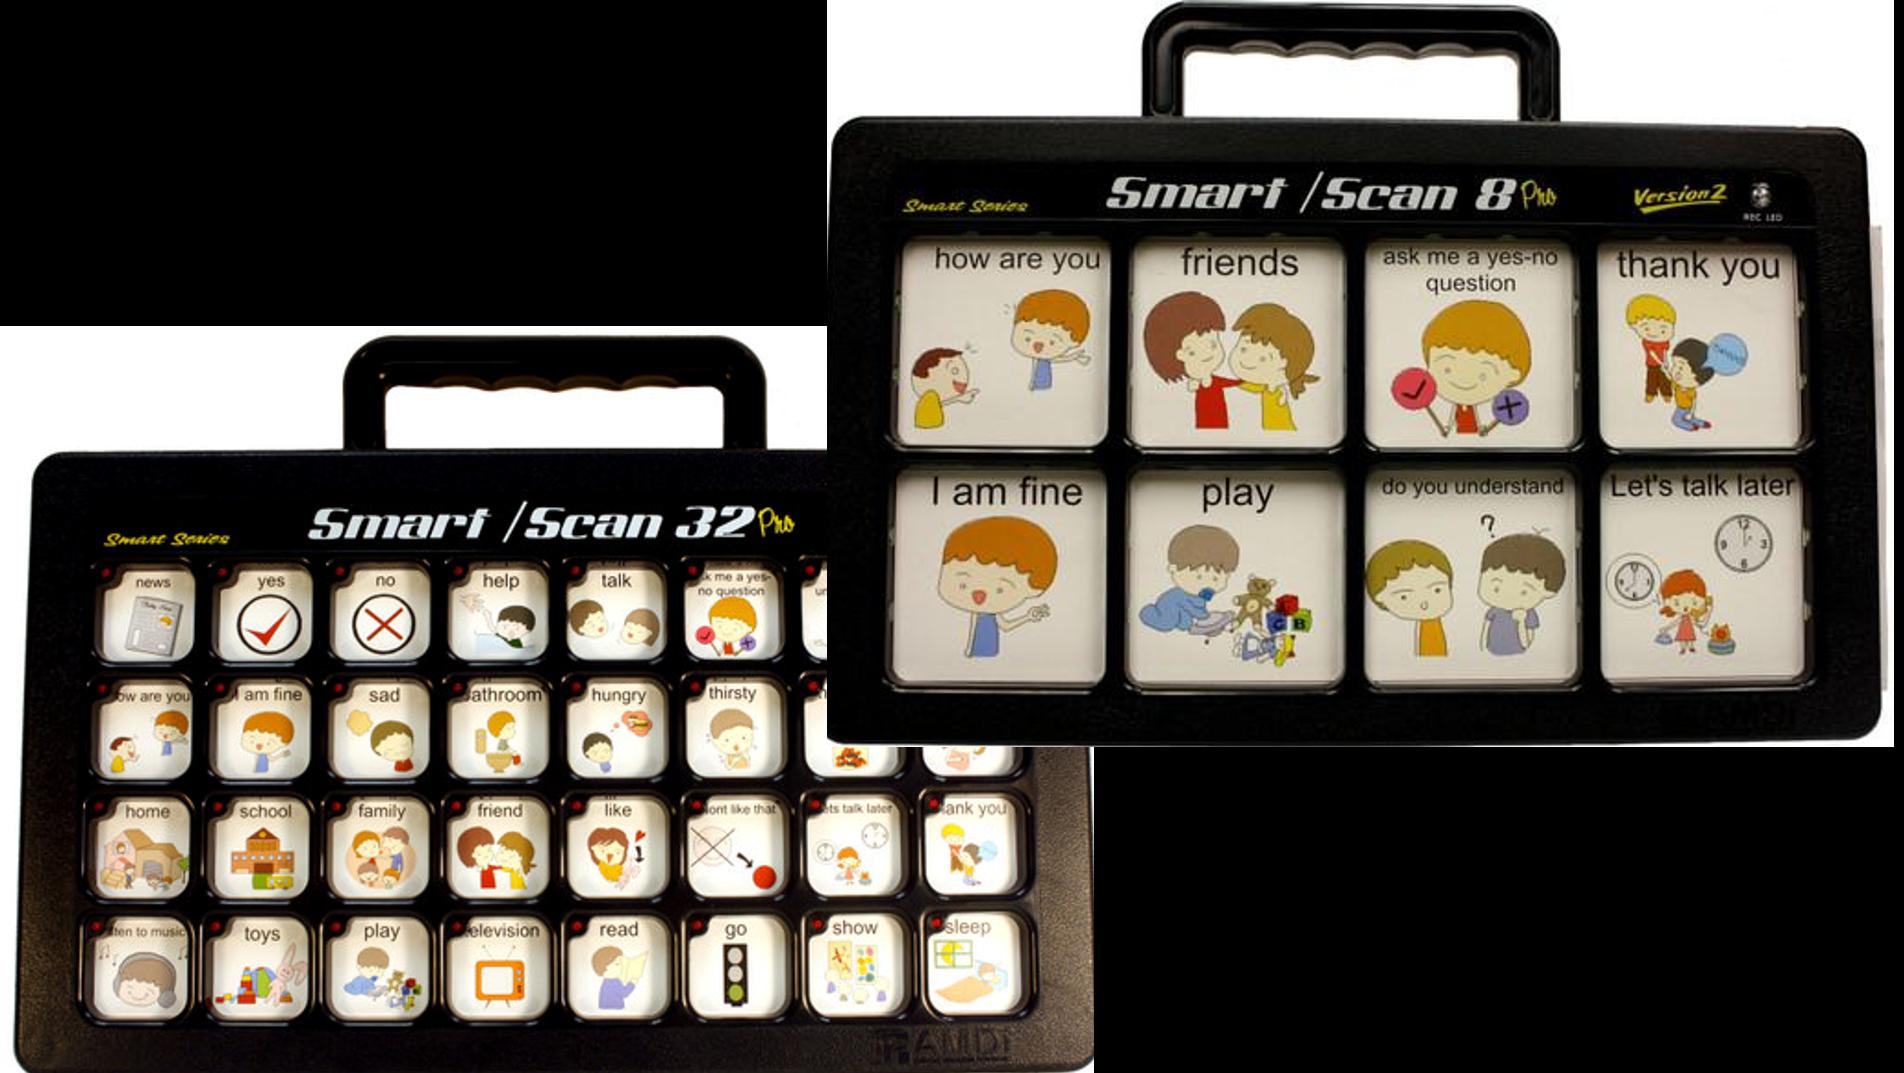 Smart/Scan Pro Communication Device